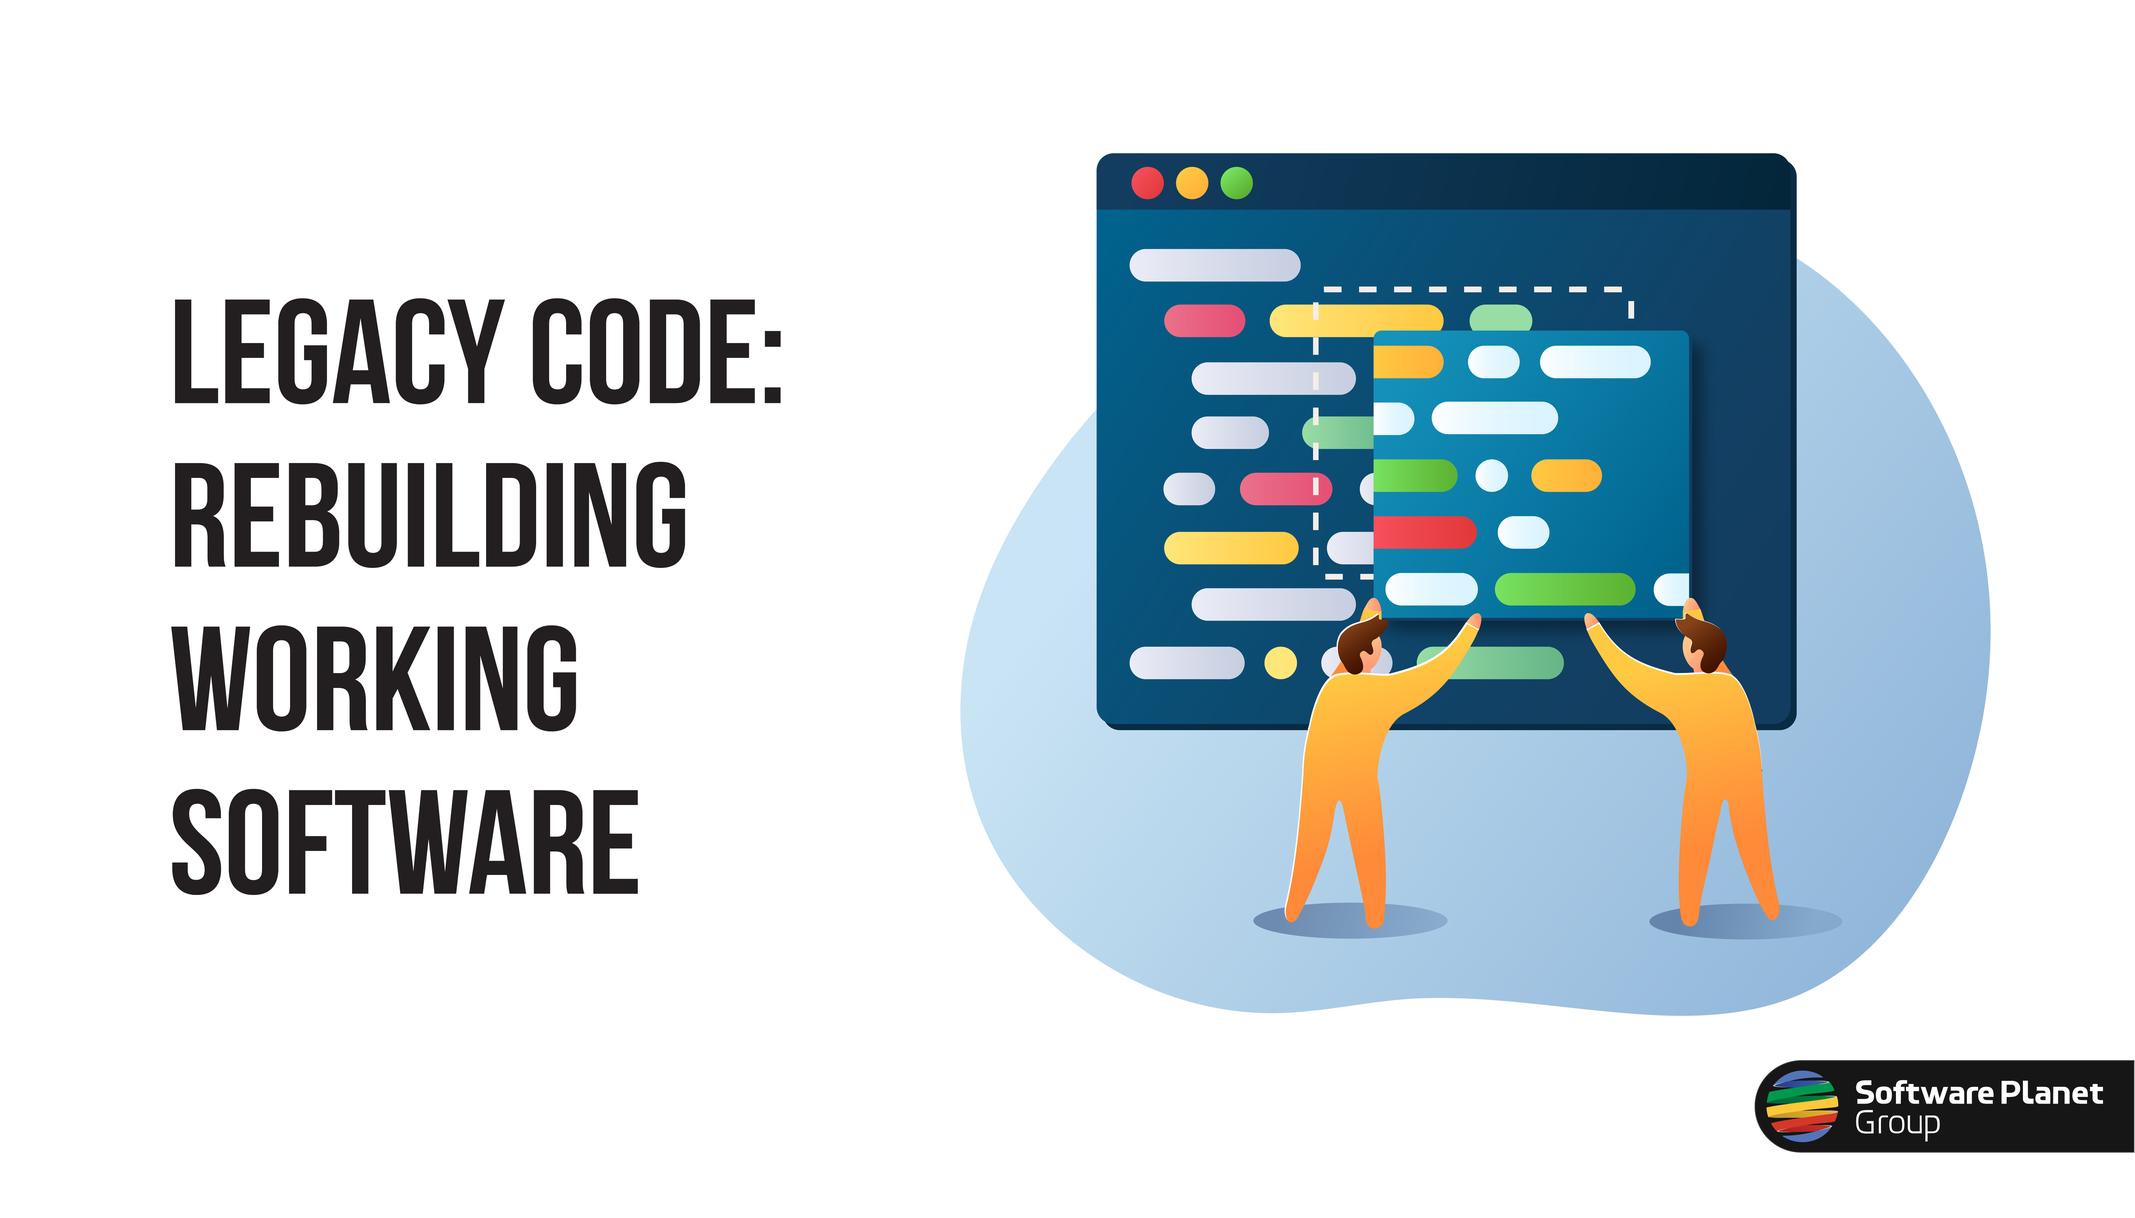 Legacy Code: Rebuilding Working Software